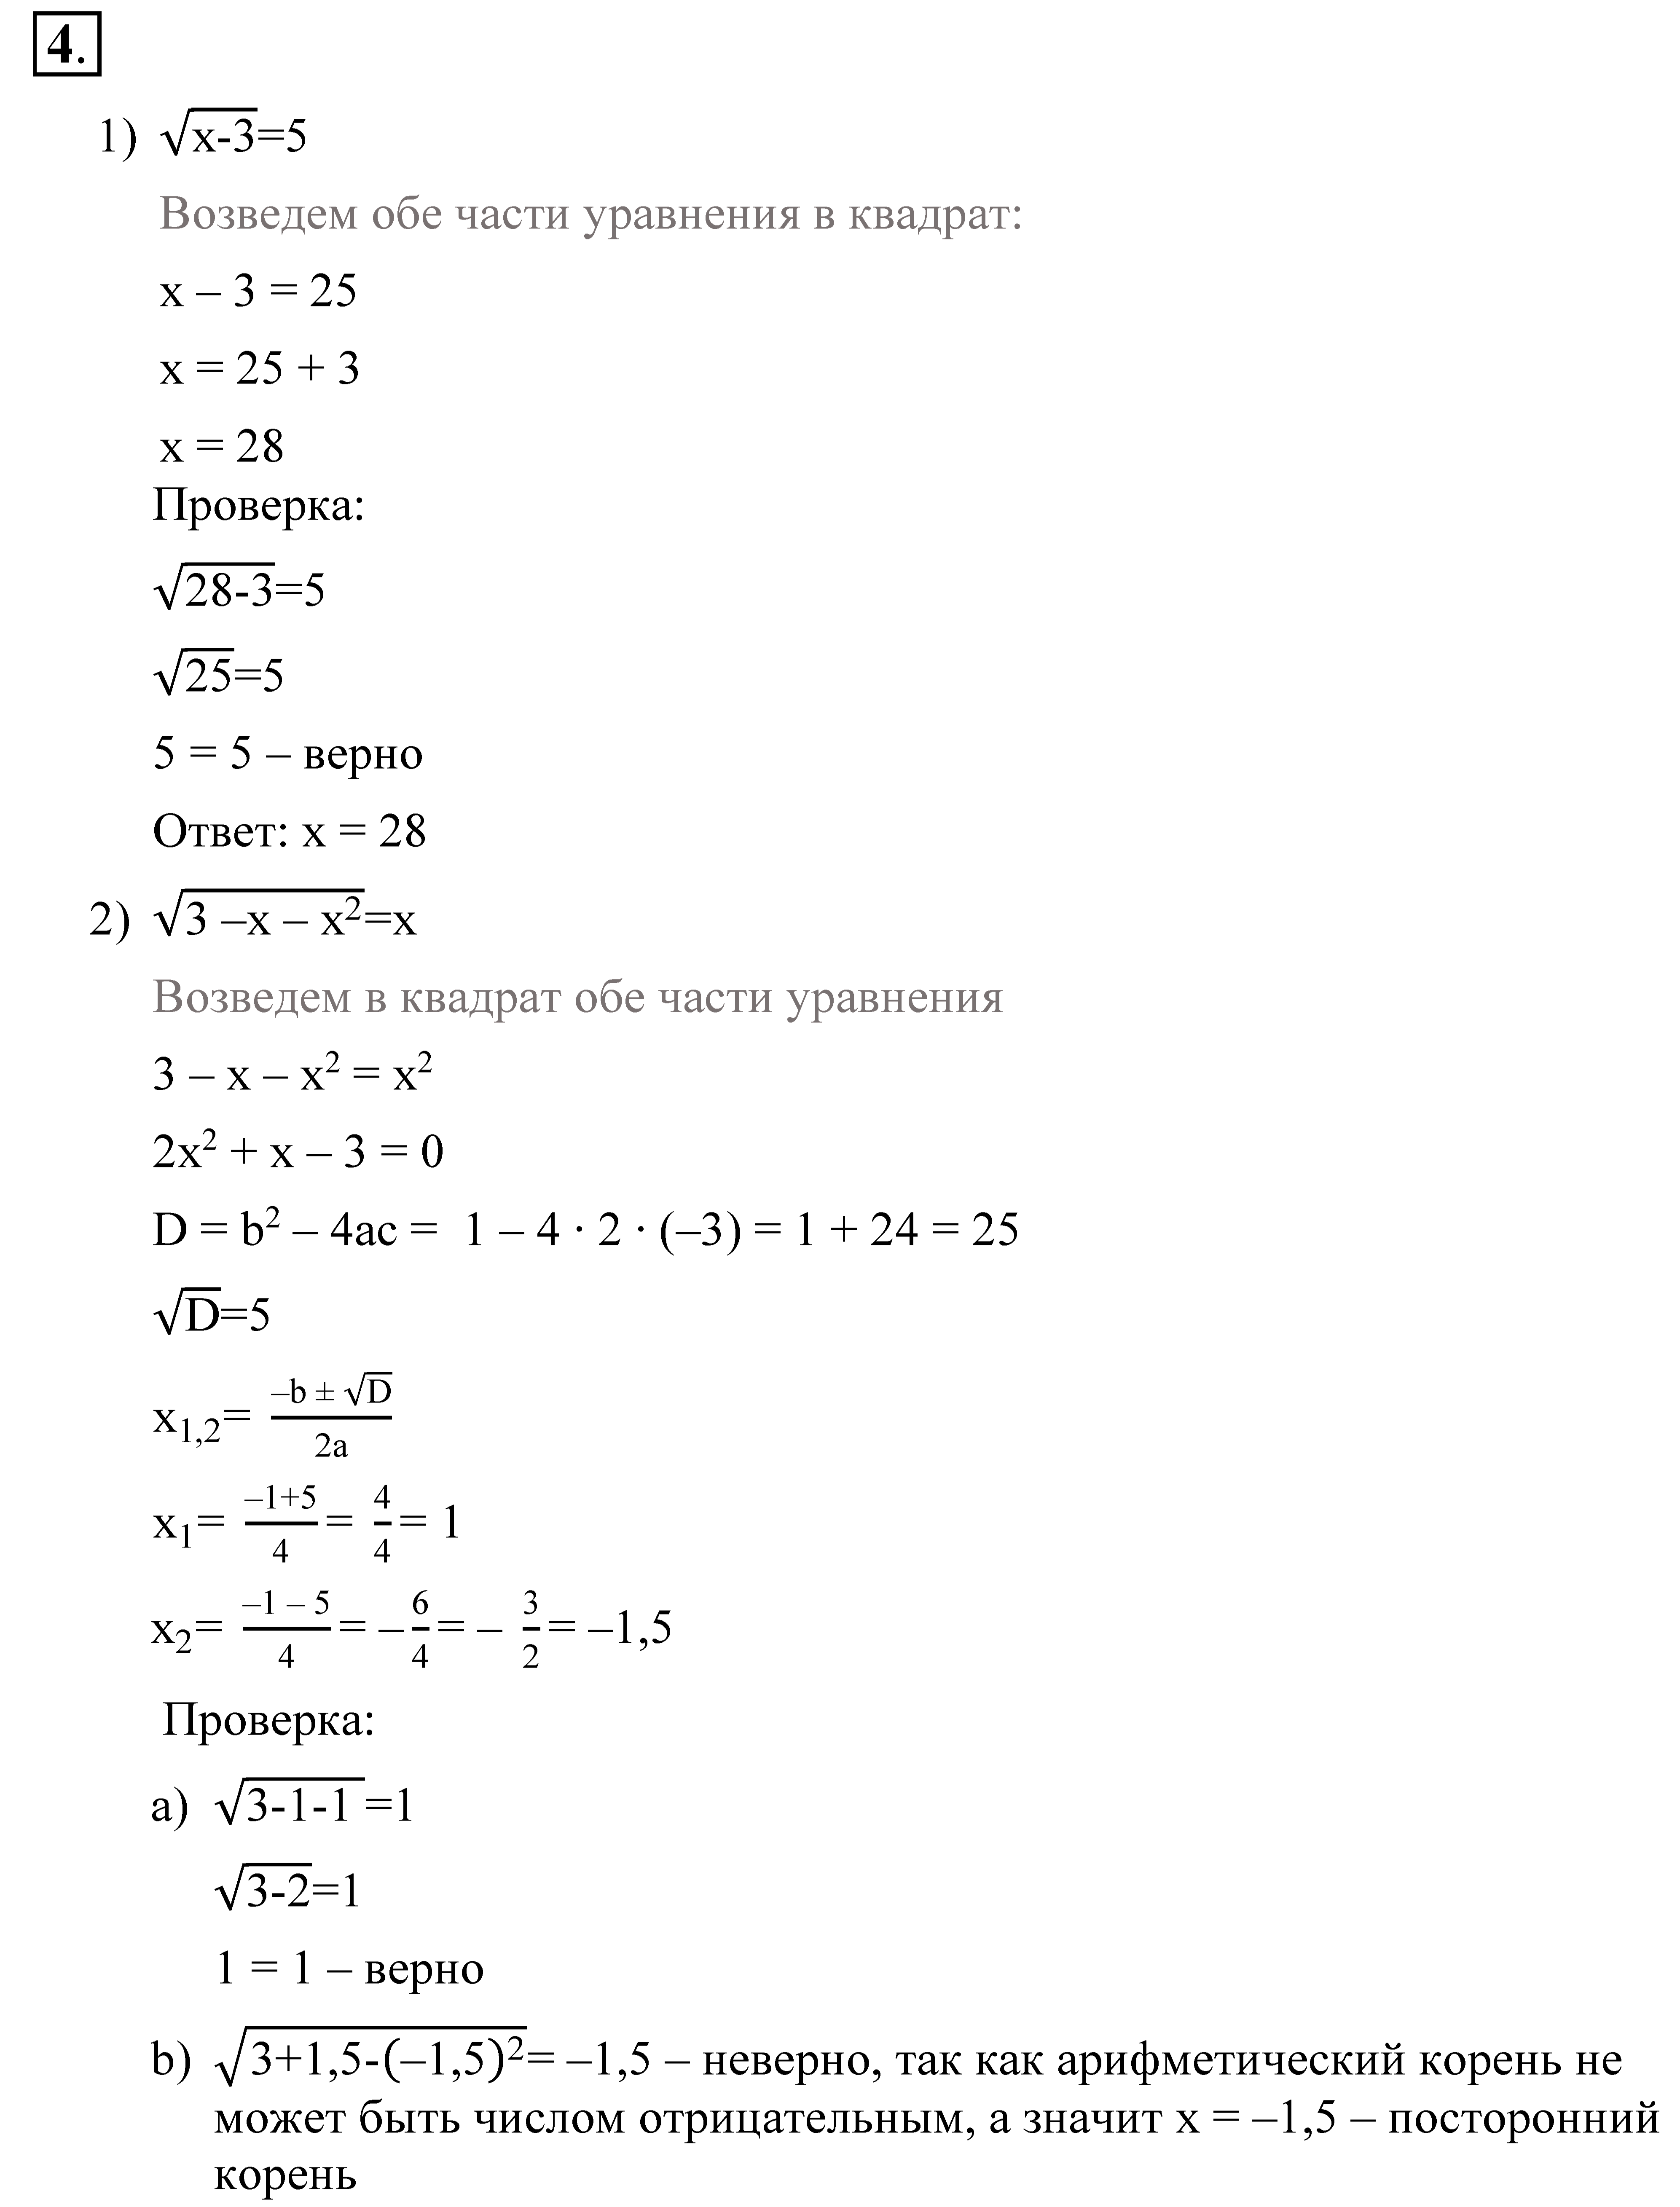 решебник себя 9 проверь класс алгебра